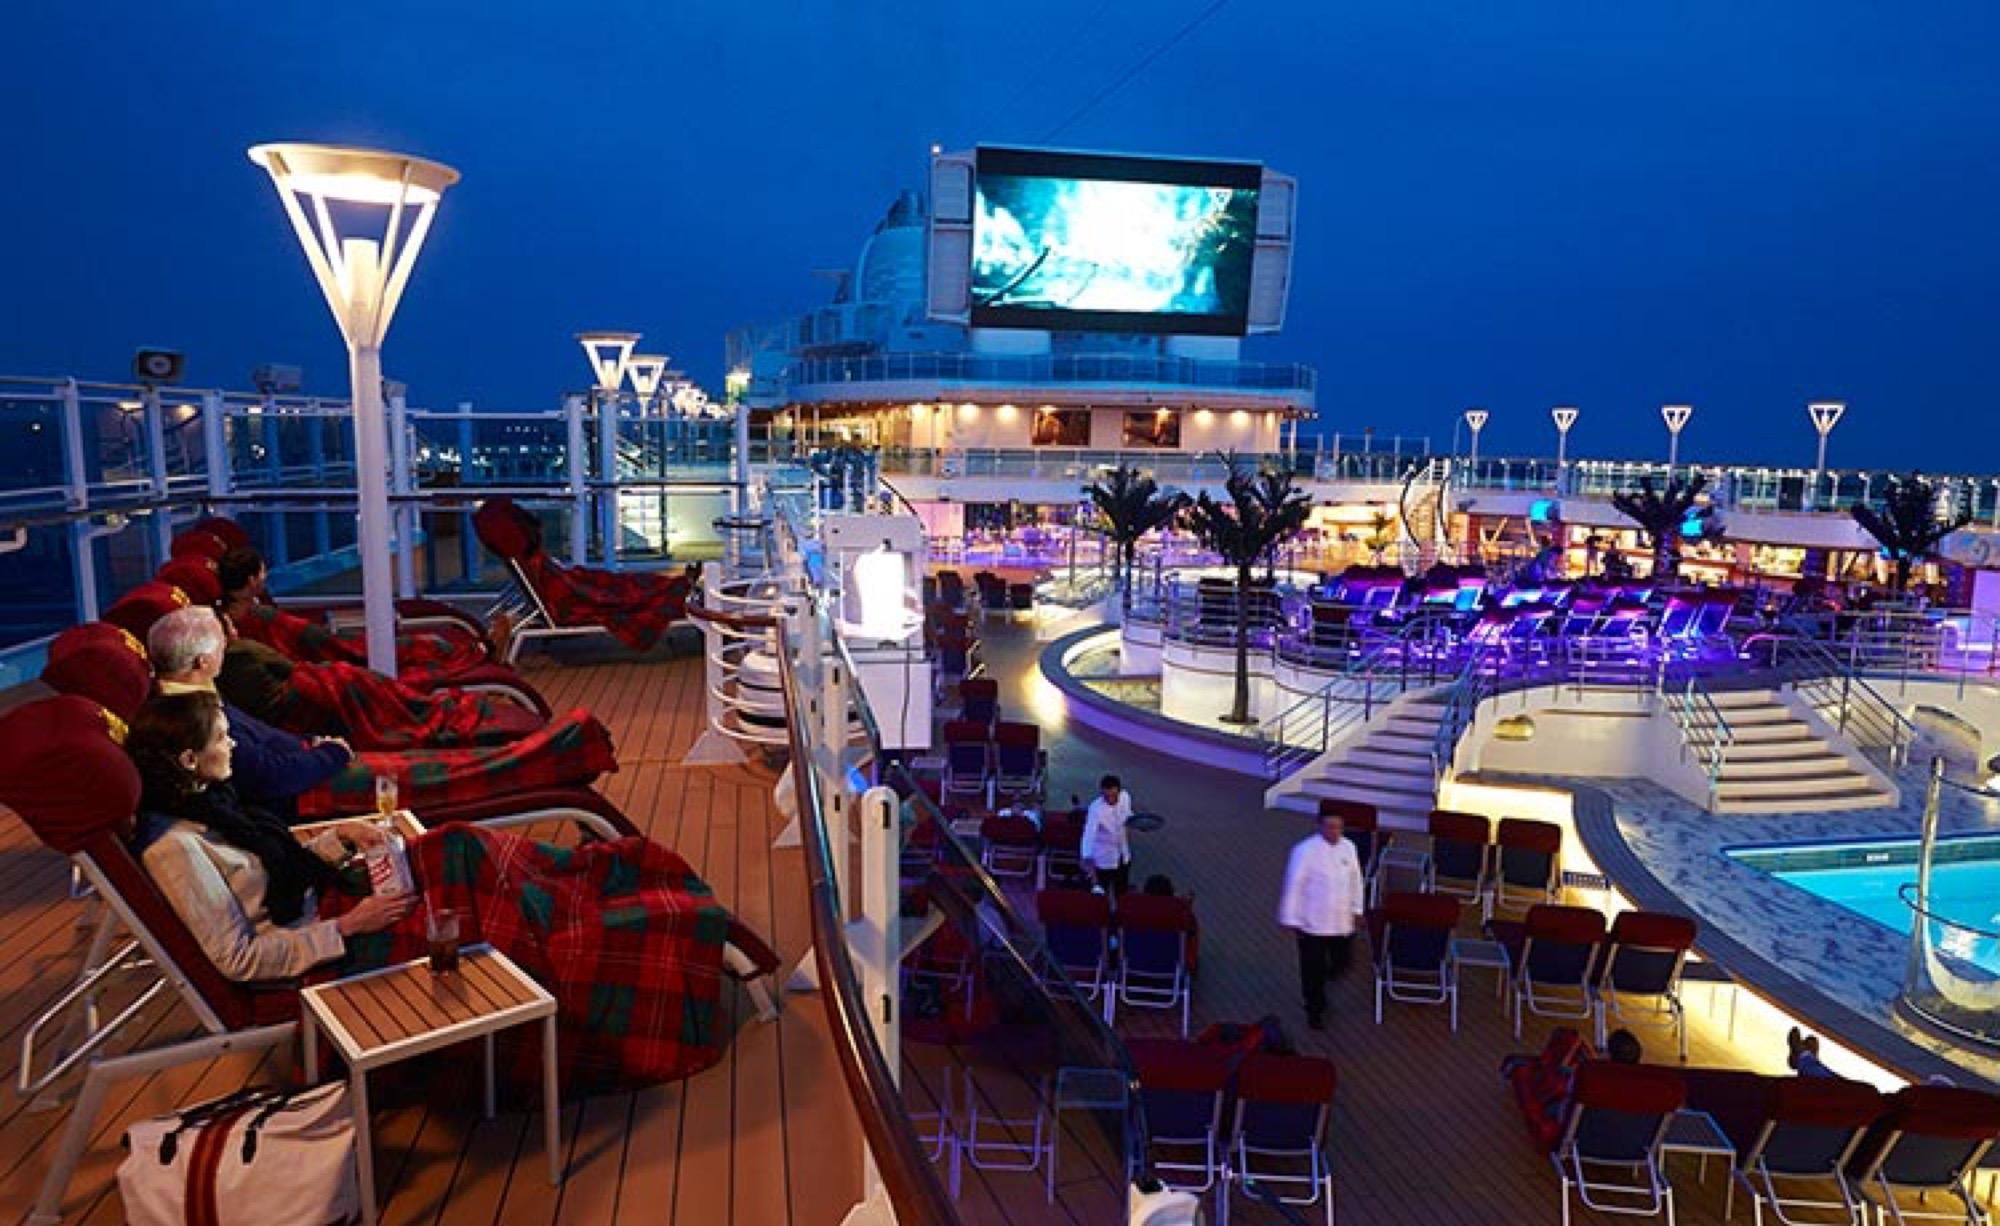 Princess Cruises Coral Class Interior movies under stars.jpg